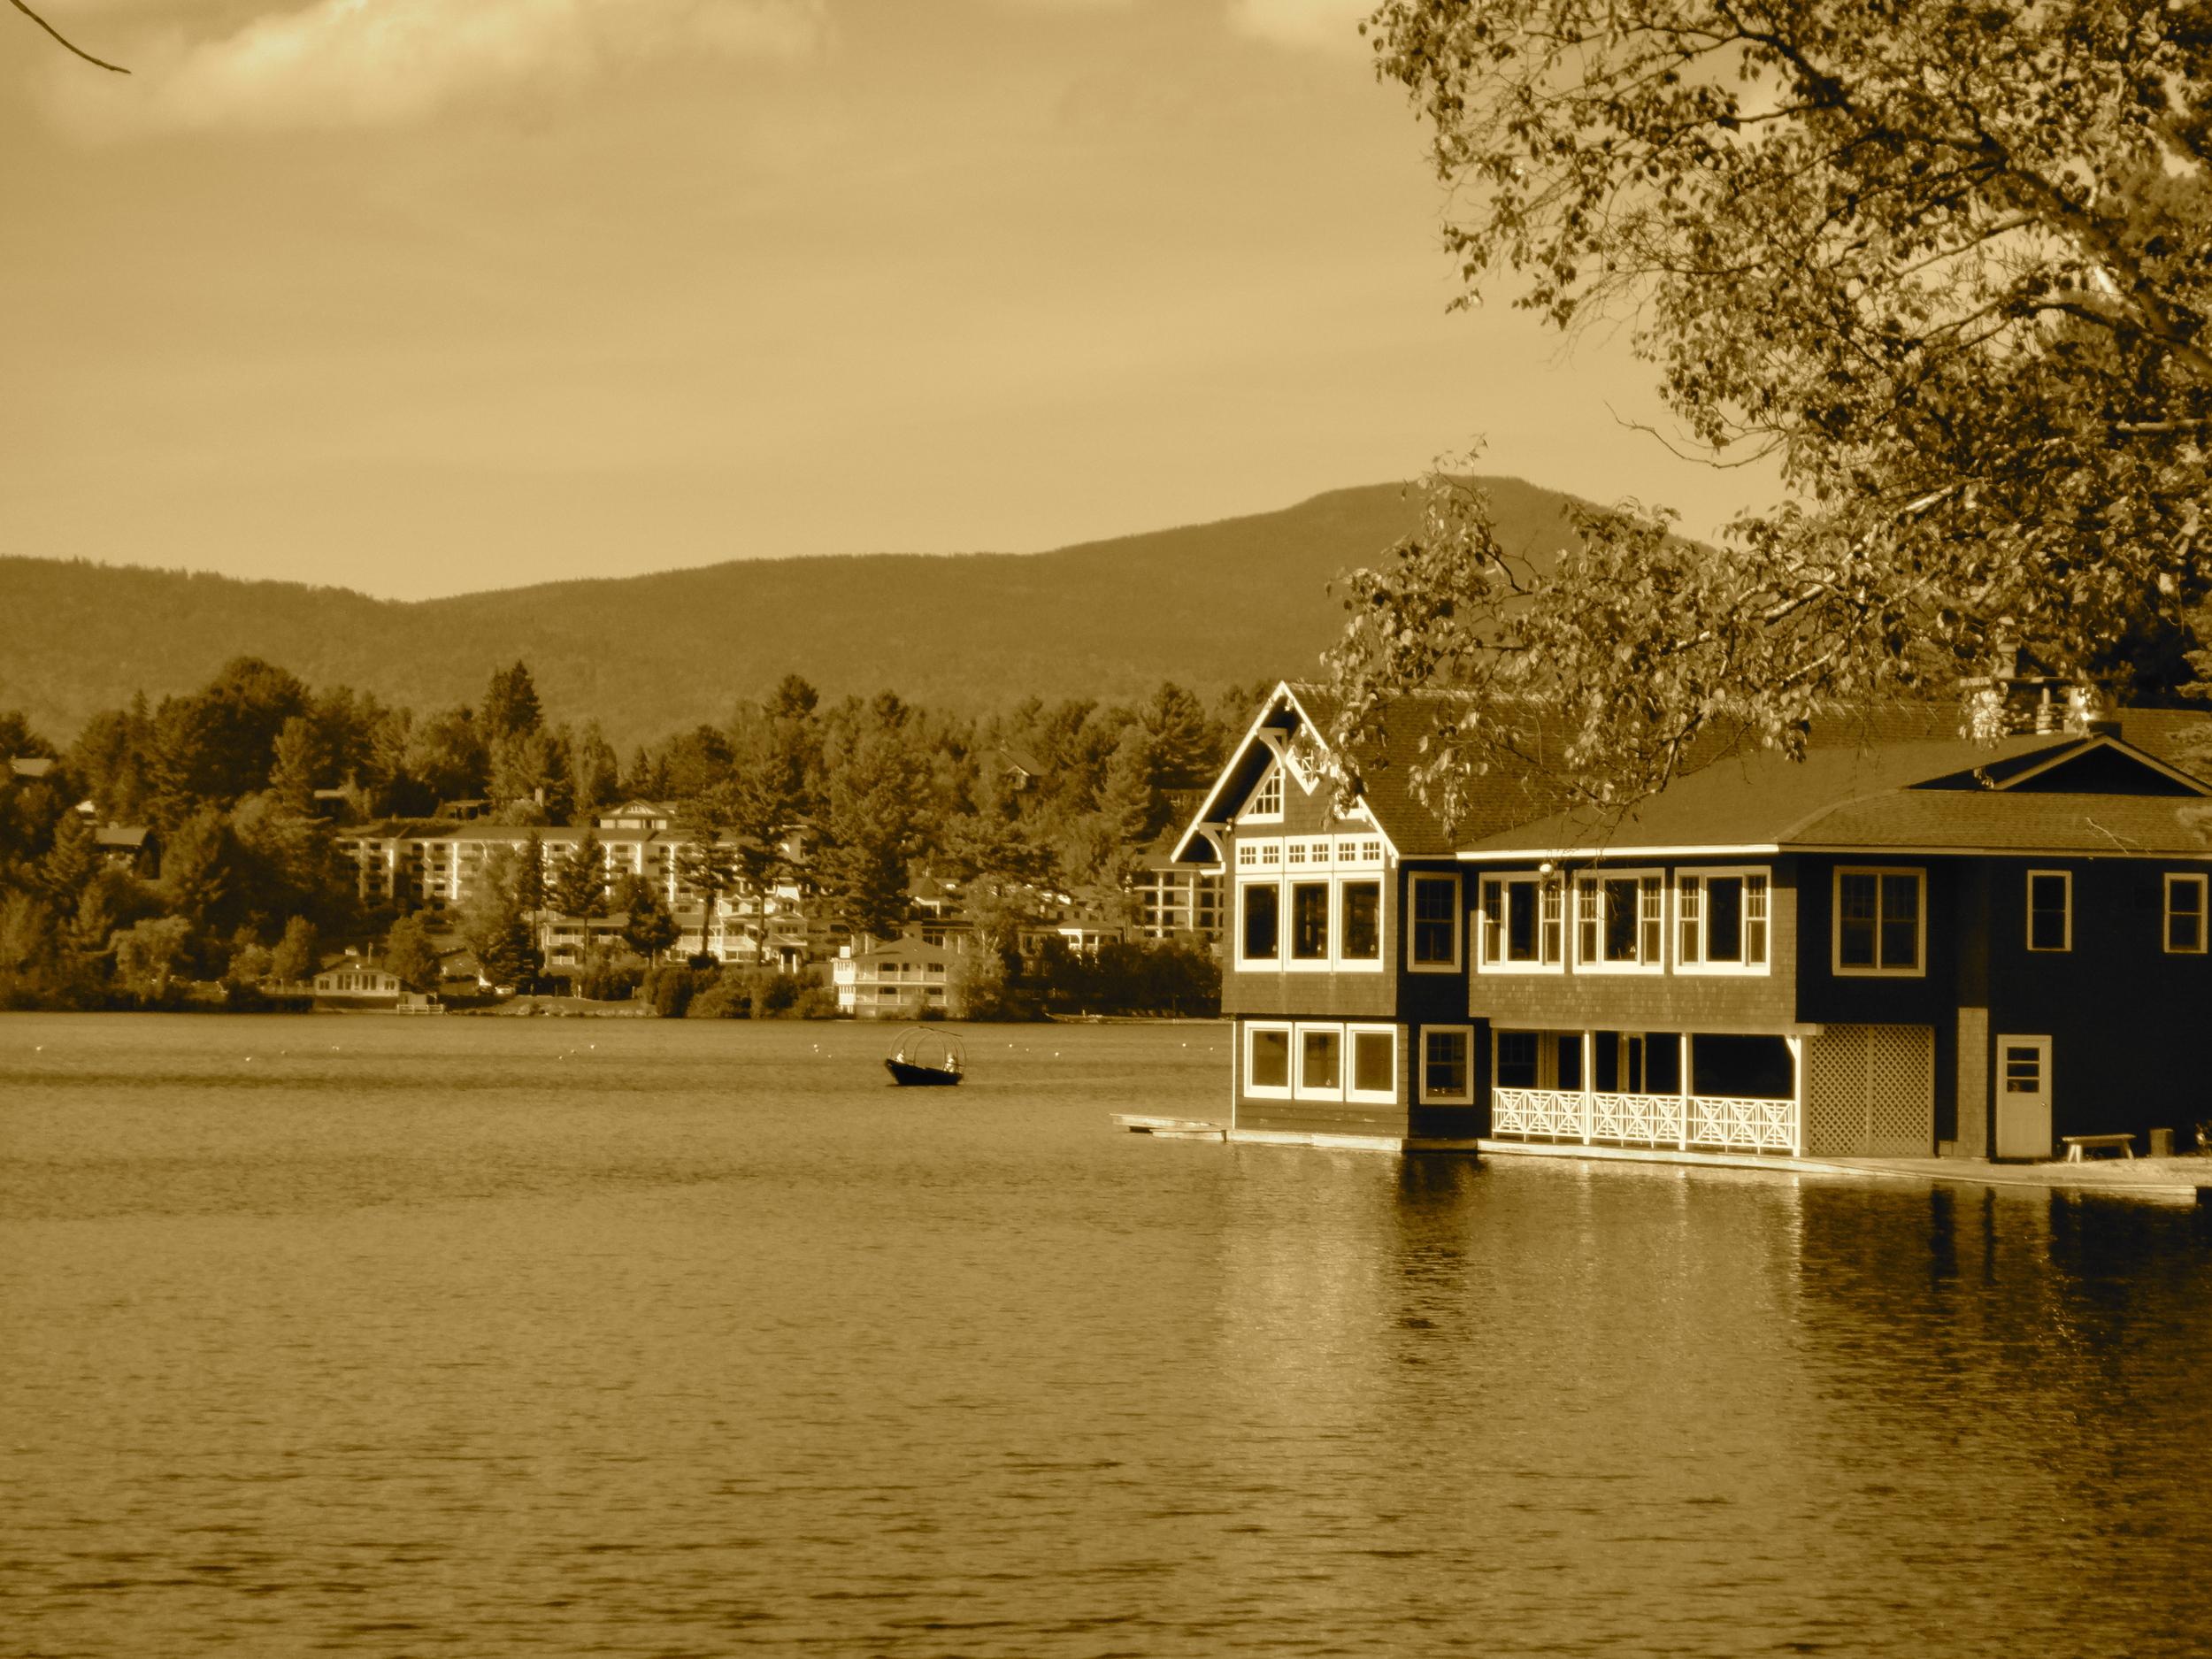 The Boathouse Restaurant on Mirror Lake